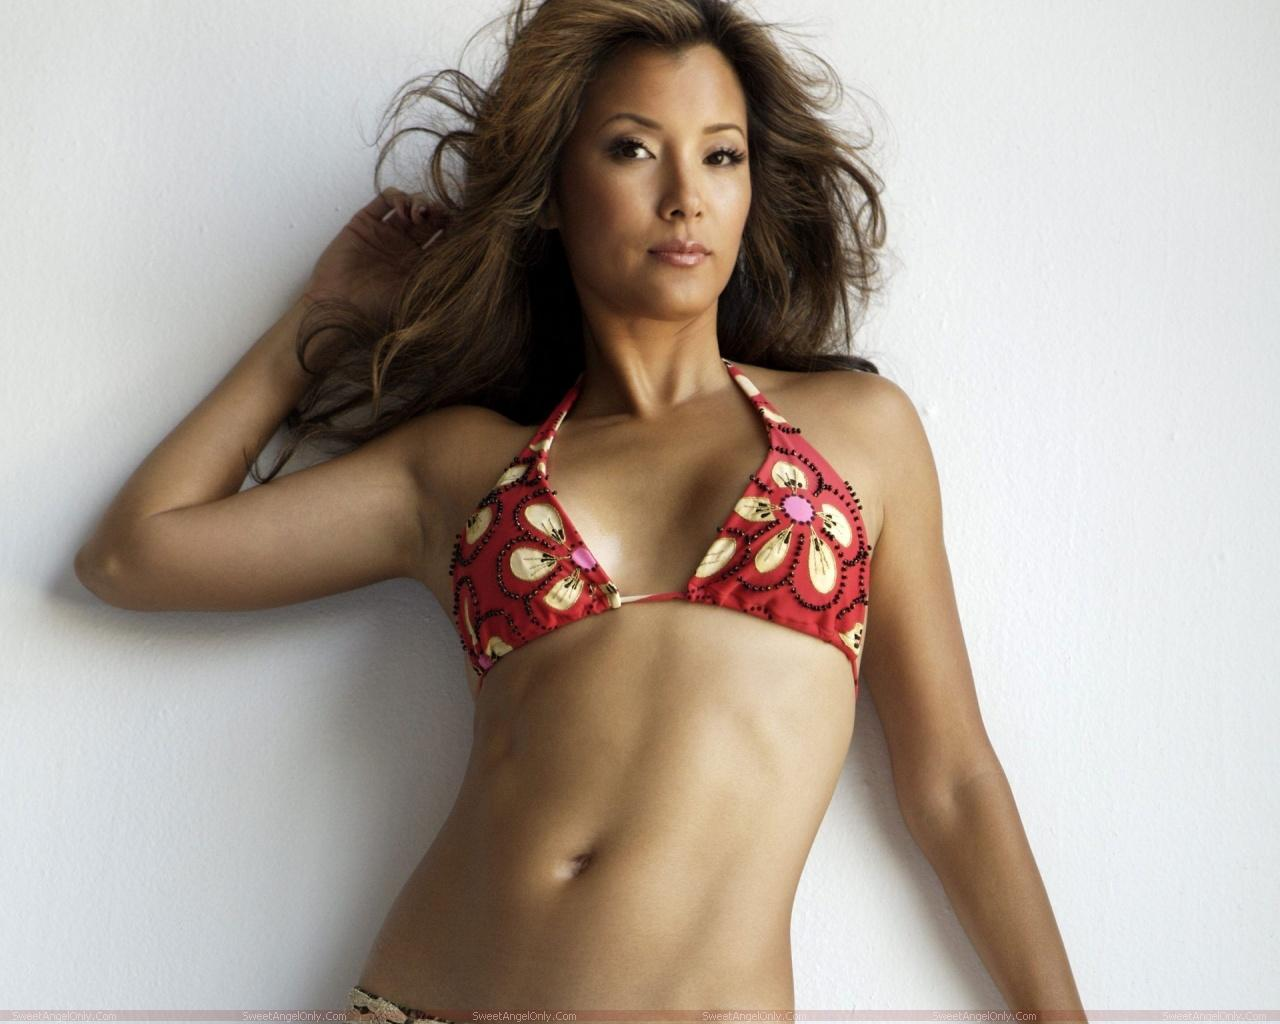 Kollywood Wallpapers Hd Unseen Kelly Hu Hot Wallpapers 521 Entertainment World